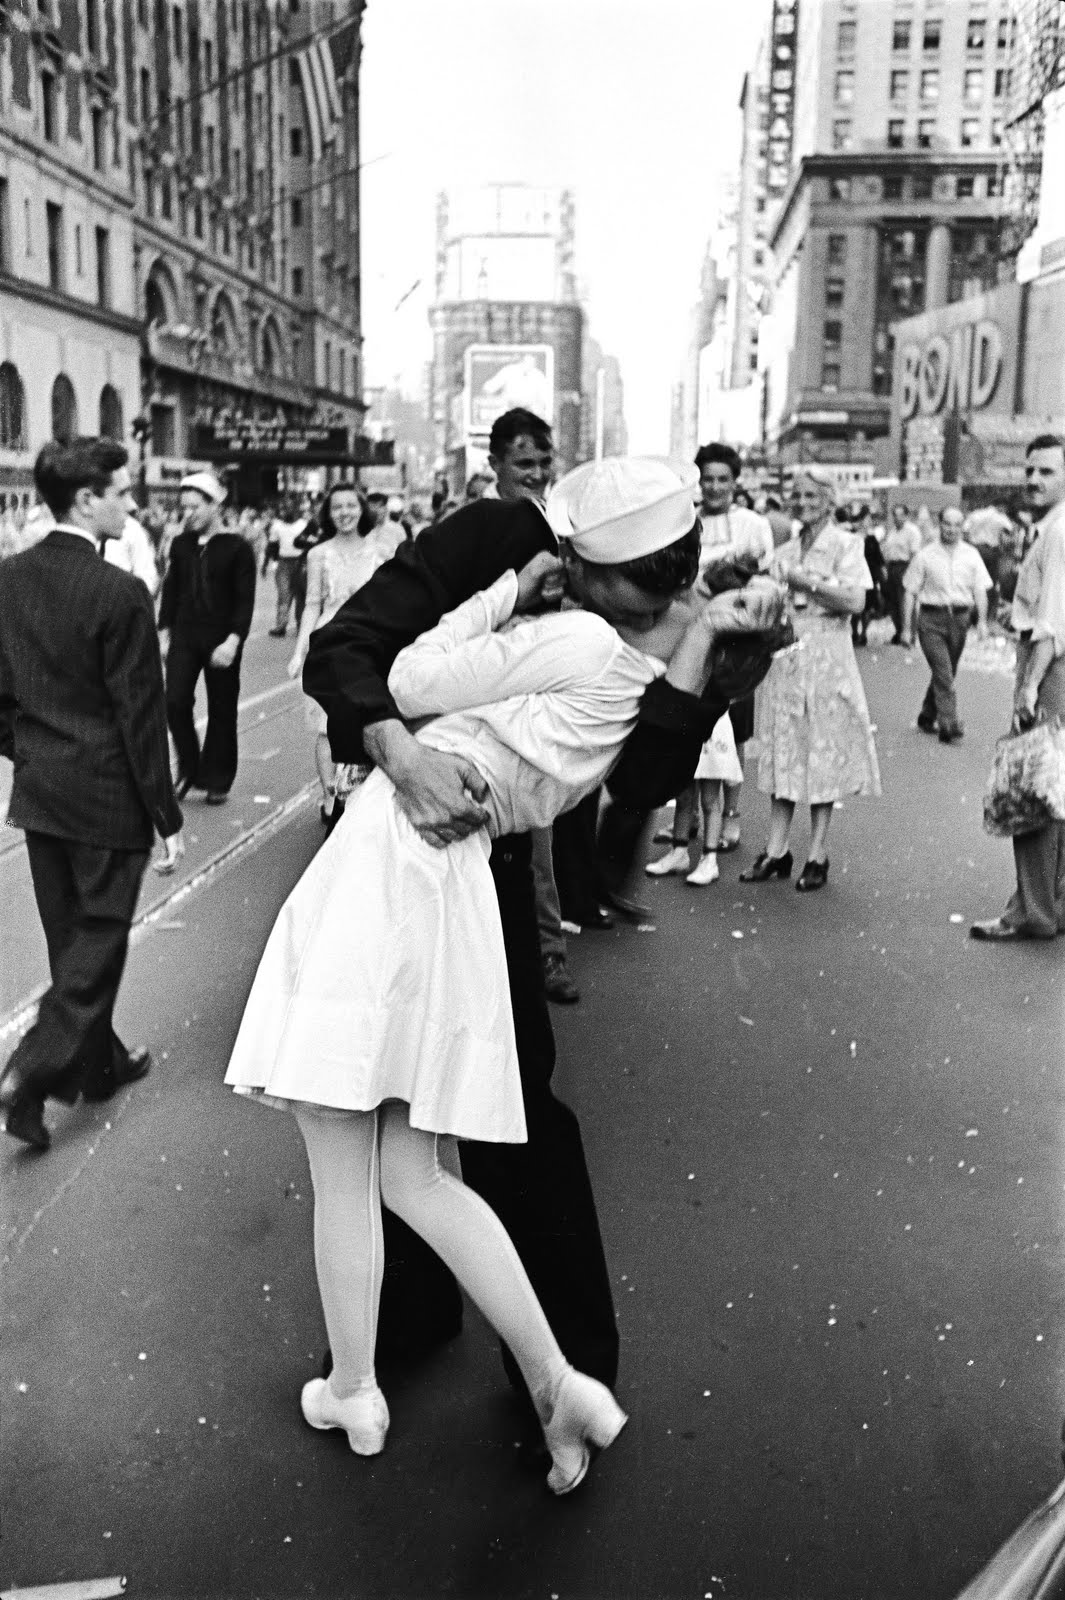 Alfred Eisenstaedt, 'V-J Day in Times Square', 1945